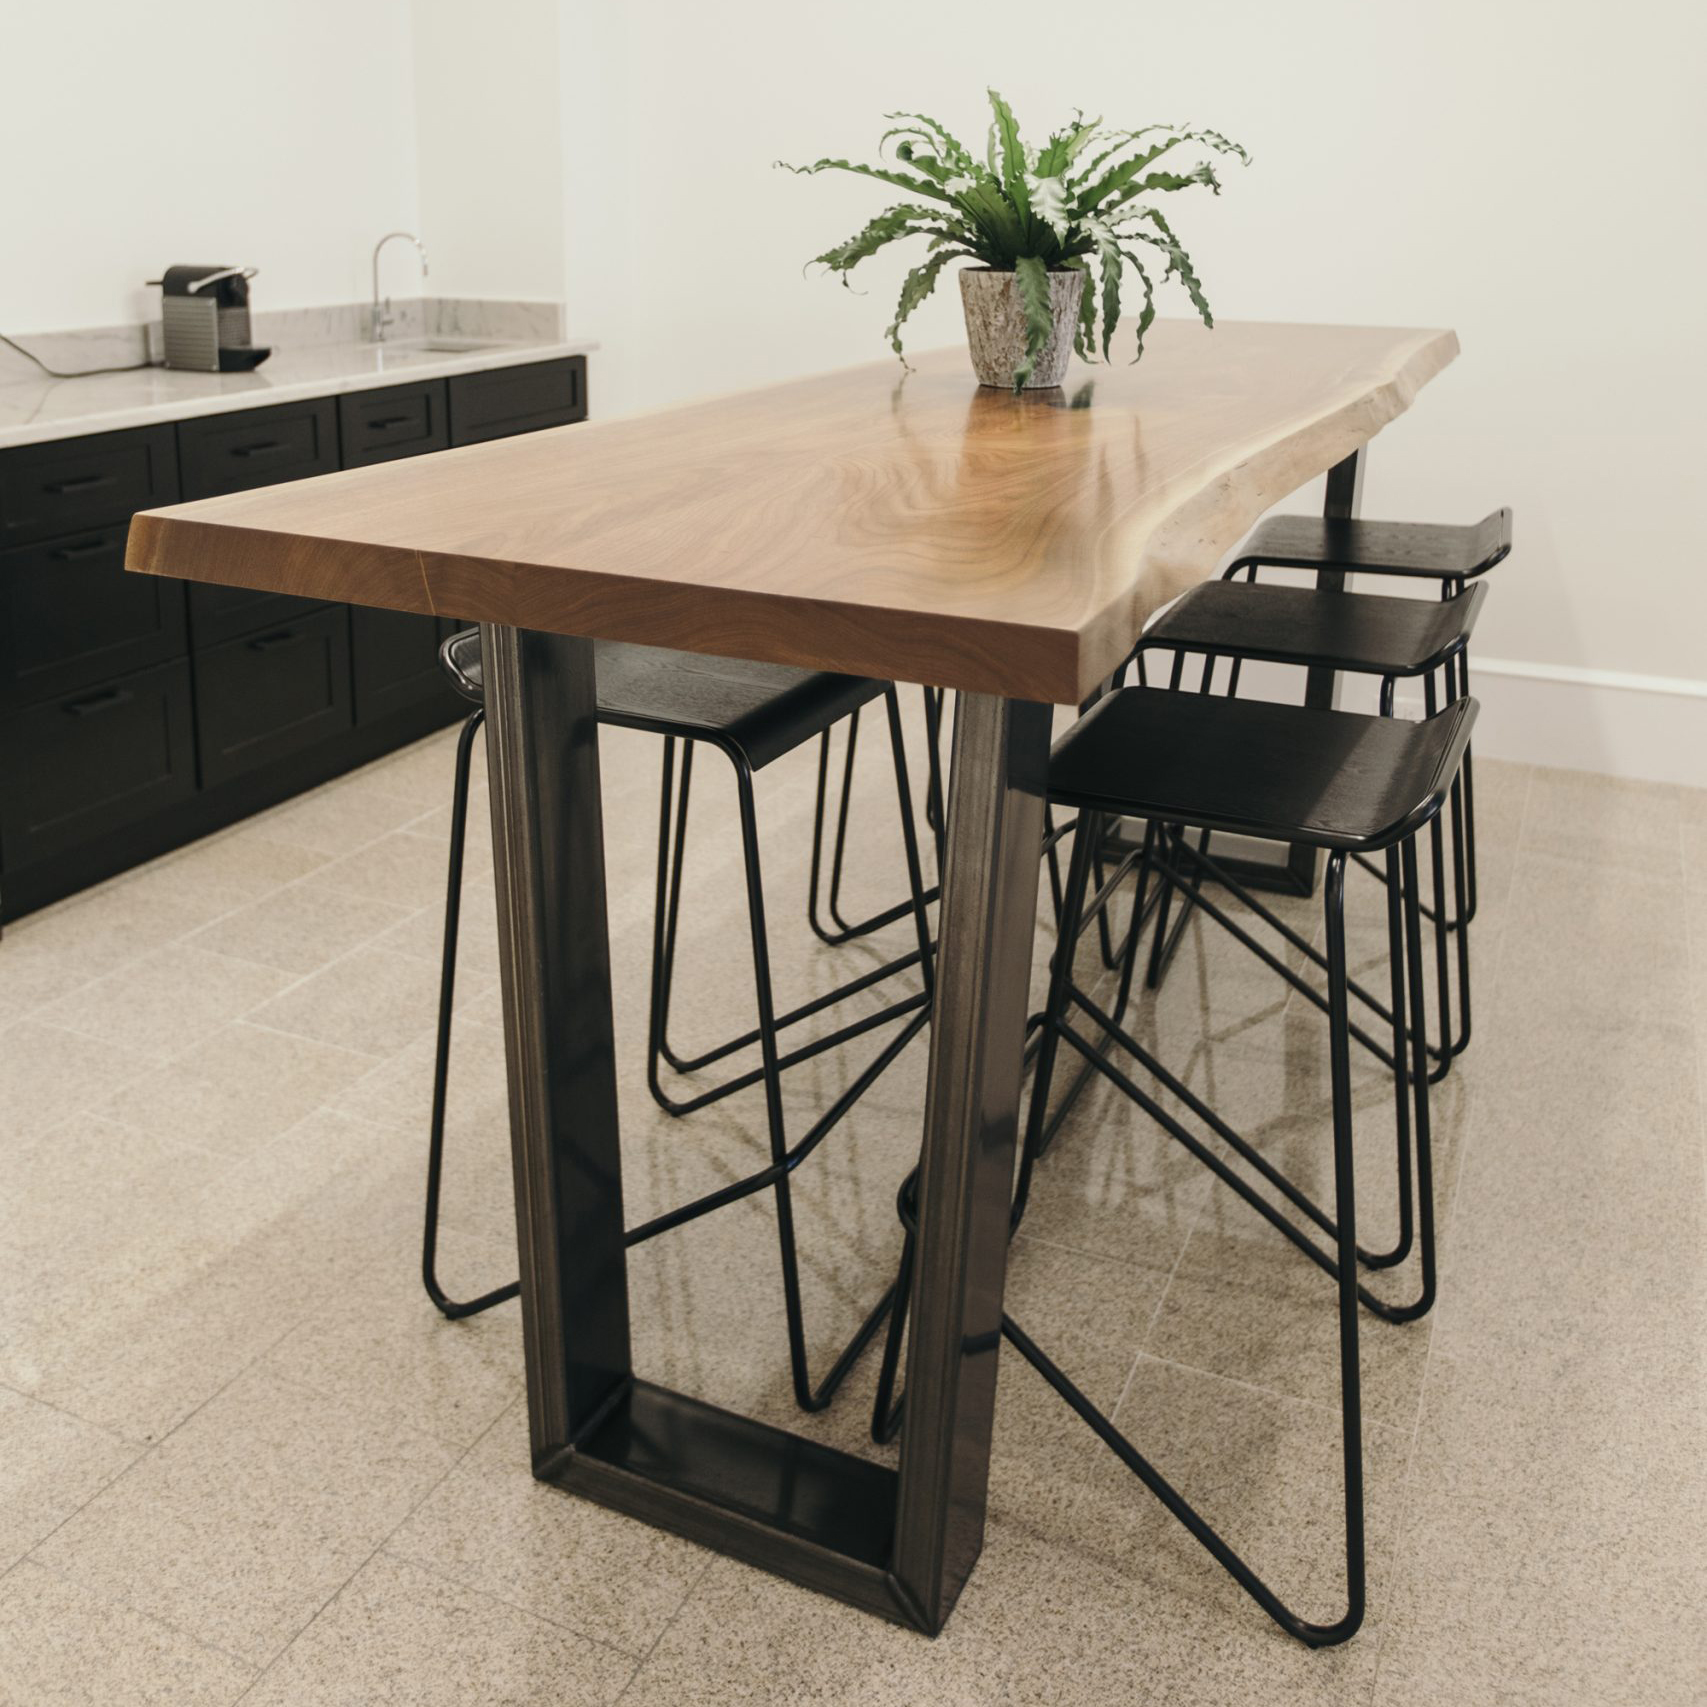 custom wood kitchen table